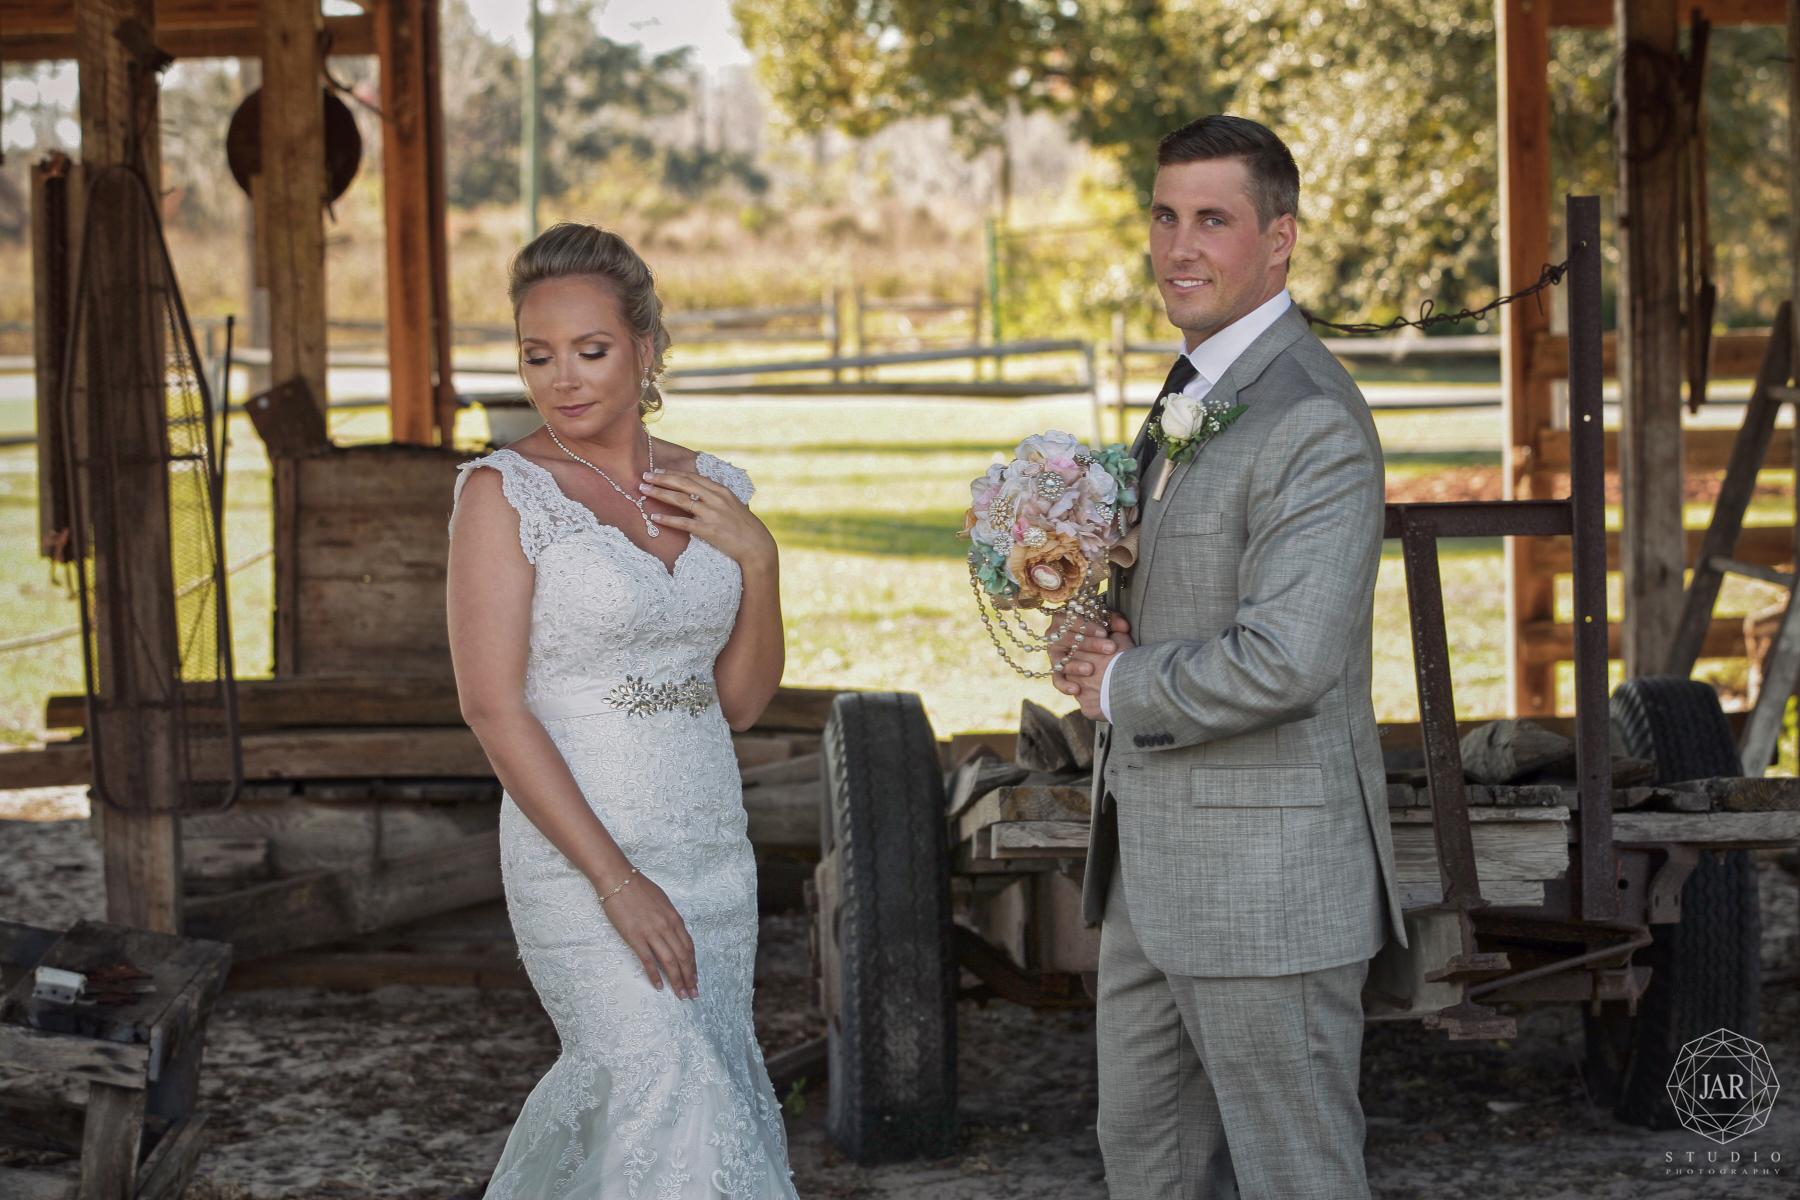 25-rustic-wedding-original-beautiful-ideas-orlando-jarstudio.JPG